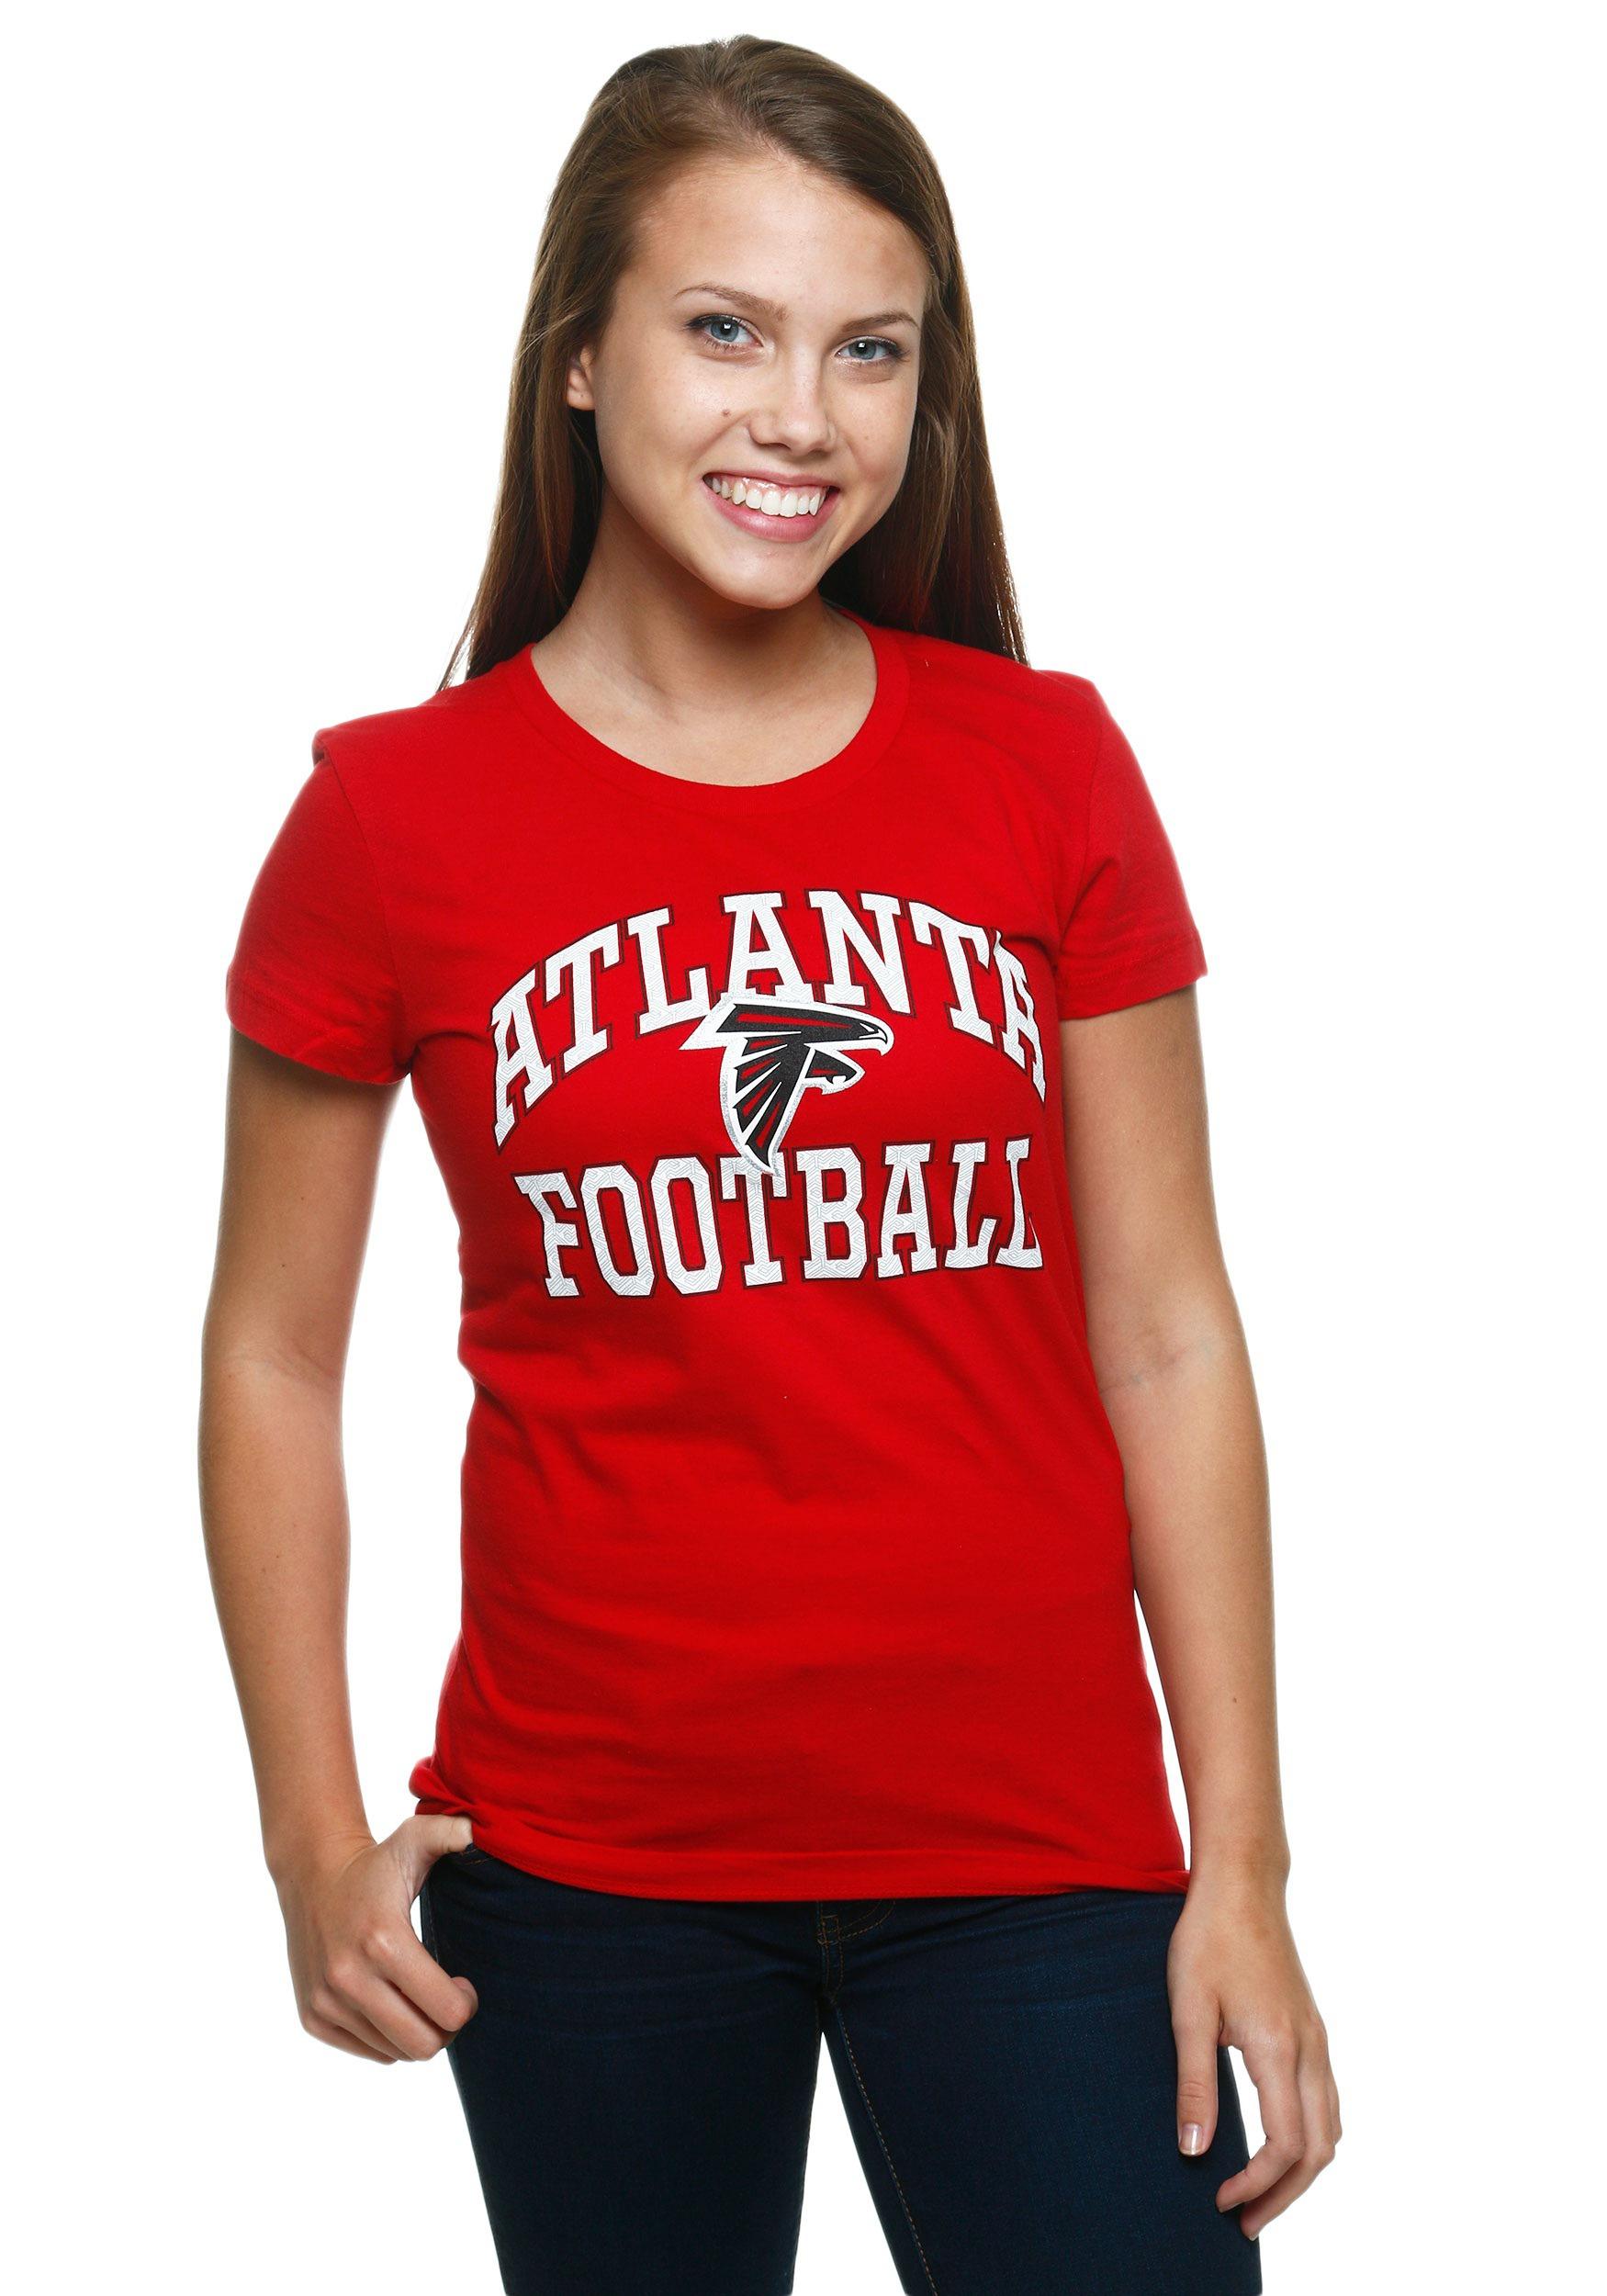 separation shoes 3ae0c 69772 Atlanta Falcons Franchise Fit Women's T-Shirt